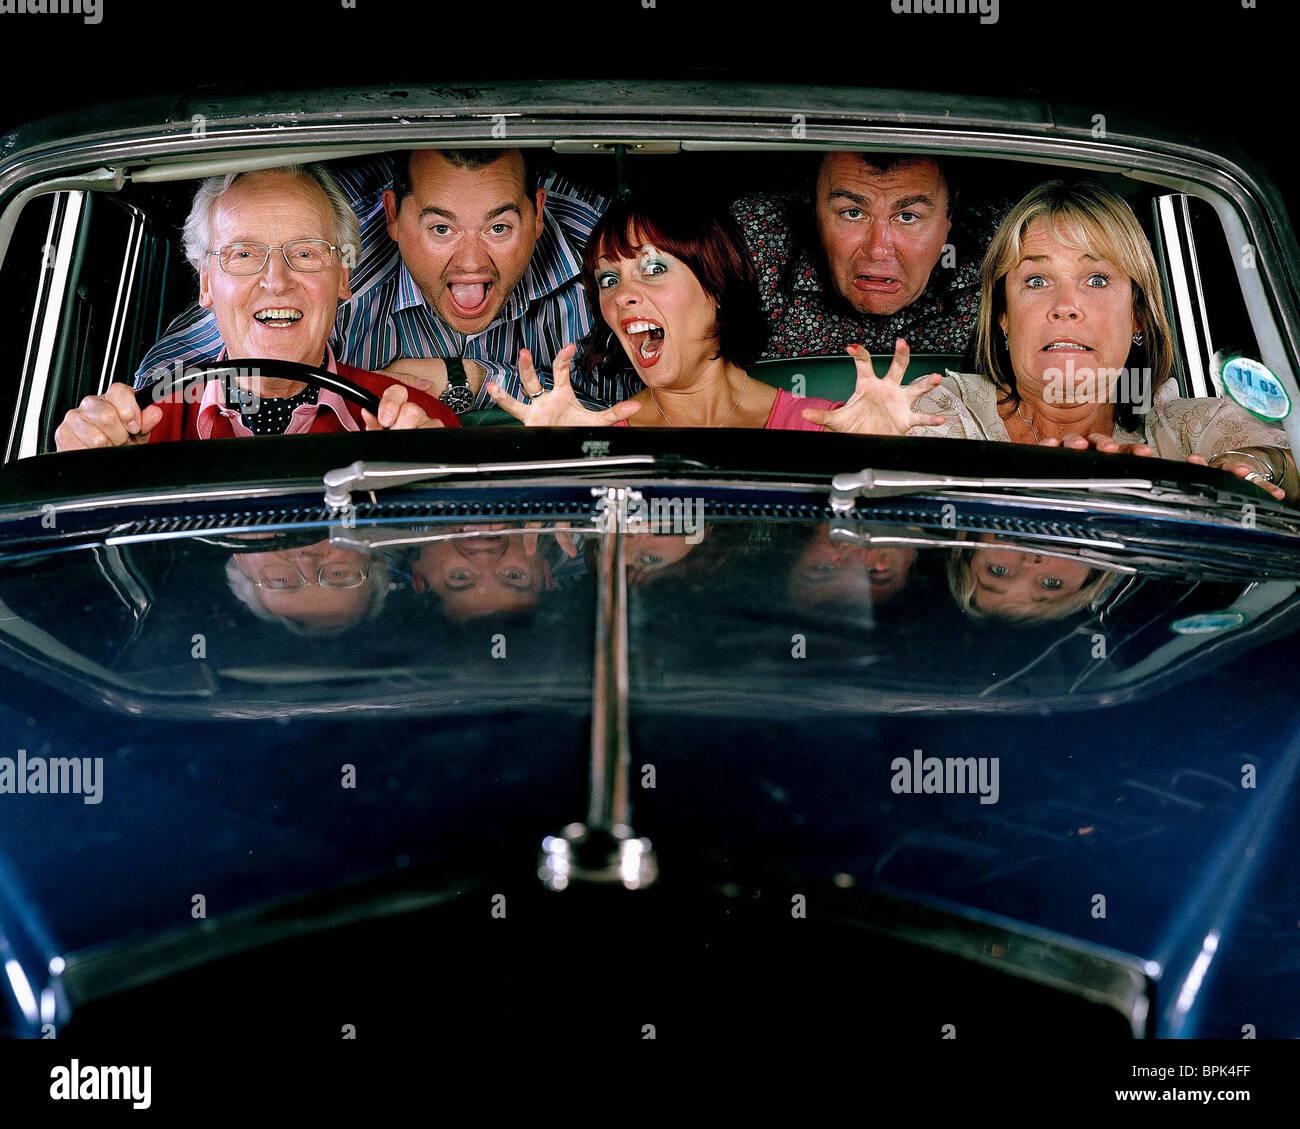 NICHOLAS PARSONS JEREMY SPAKE SARAH CAWOOD PAUL ROSS & LINDA ROBSON BRITAIN'S WORST CELEBRITY DRIVER (2003) - Stock Image